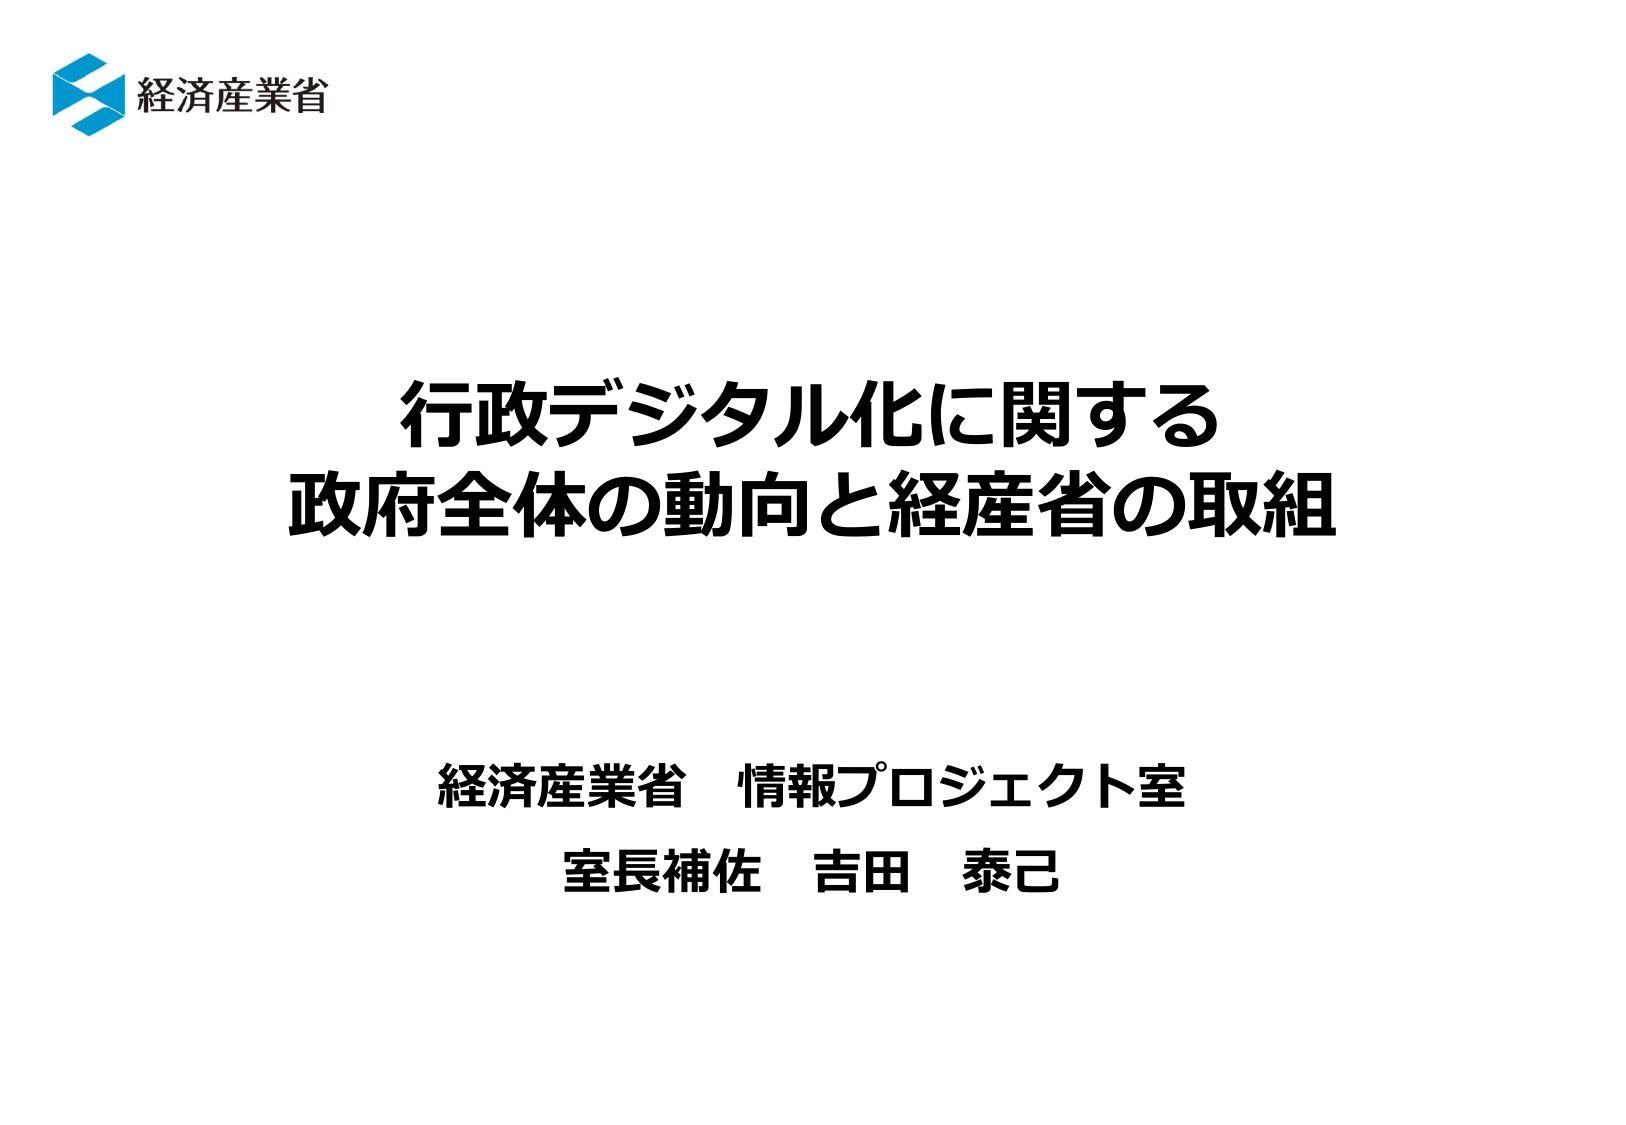 f:id:chayarokurokuro:20210408030259j:plain